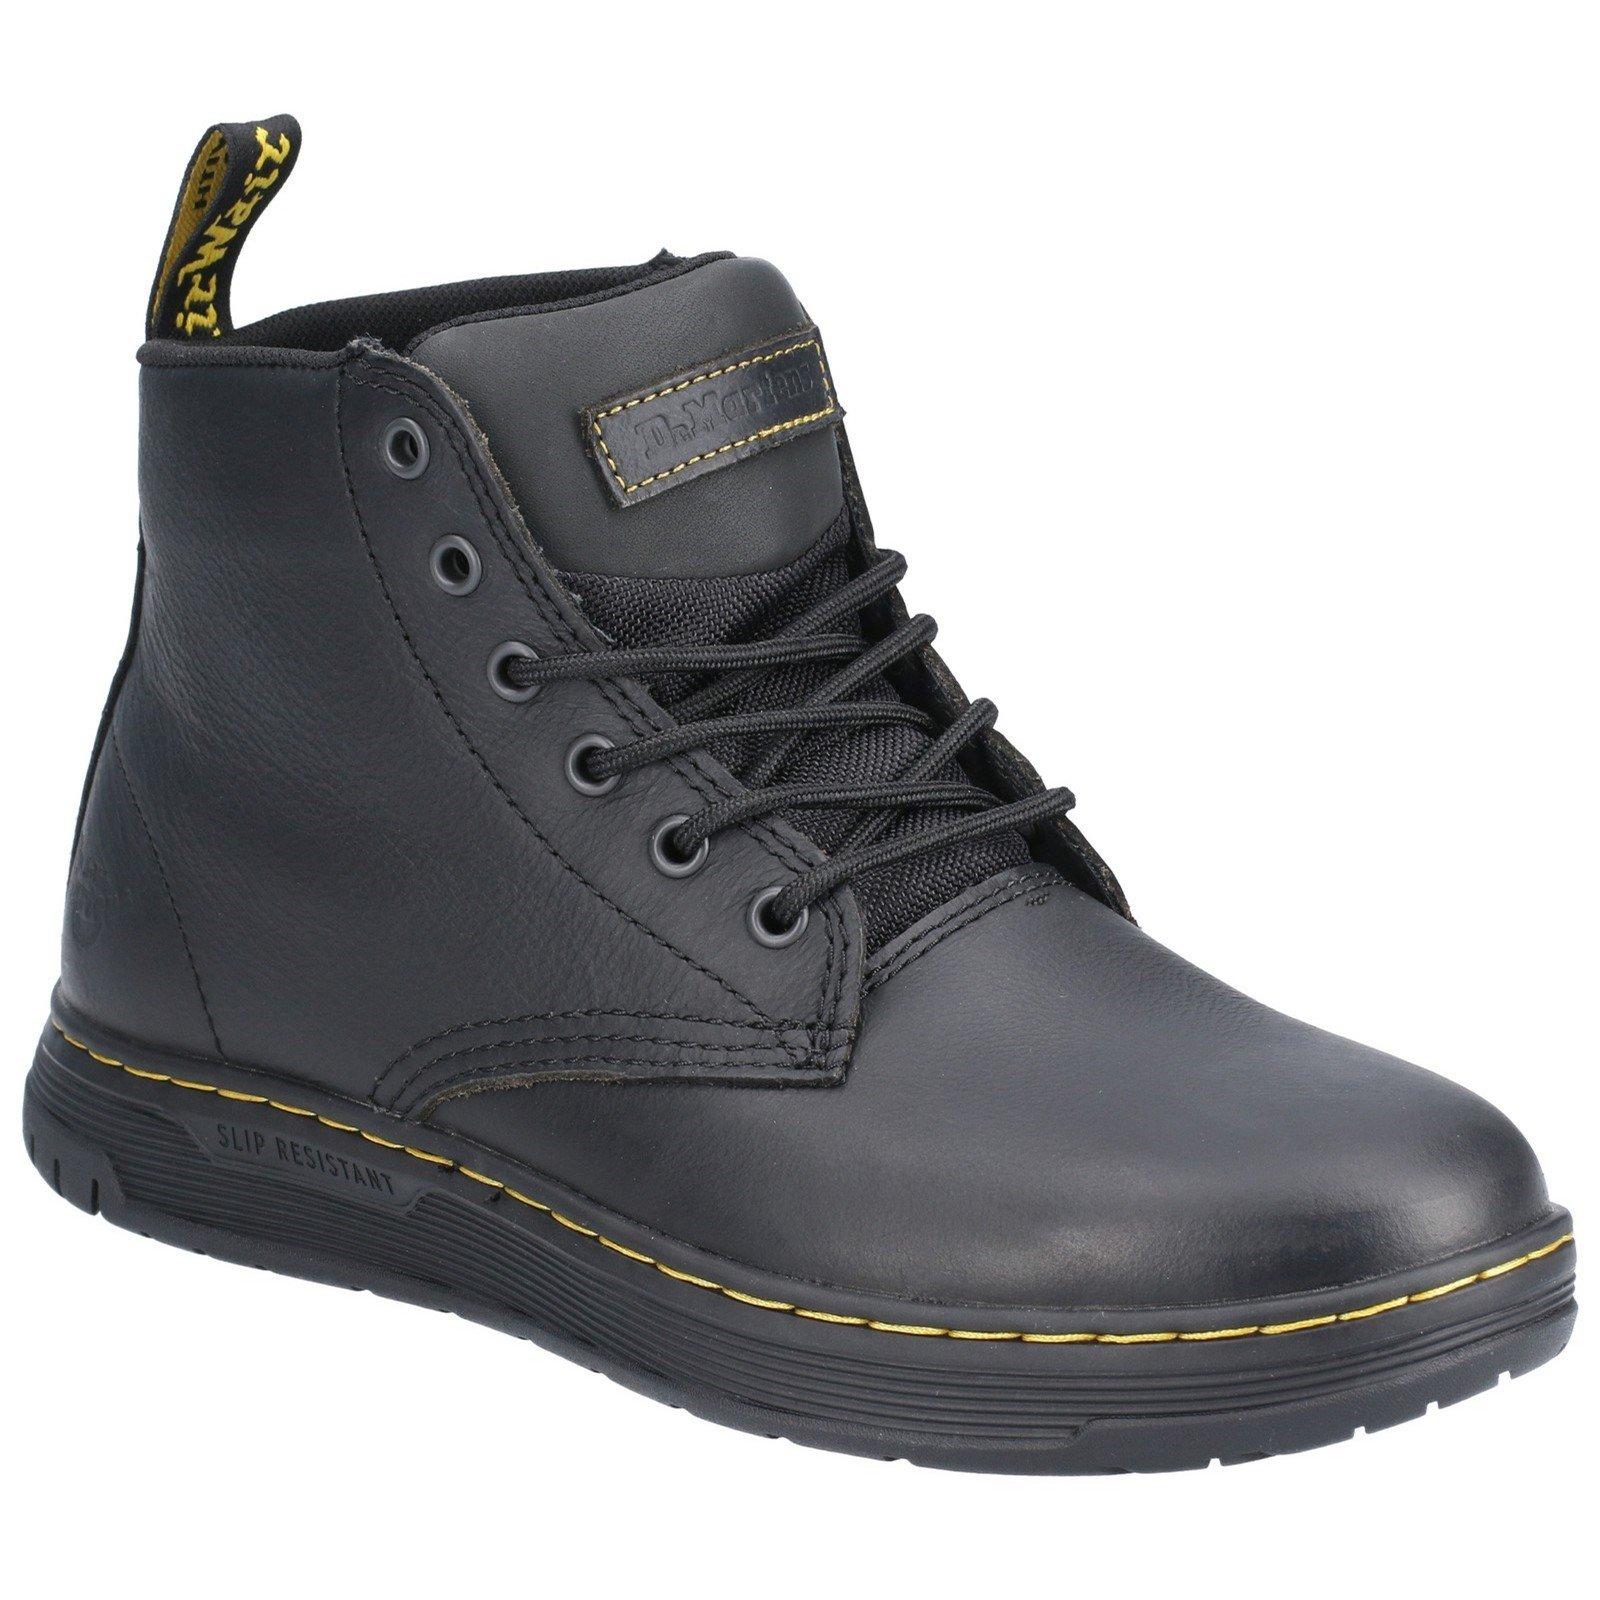 Dr Martens Men's Amwell Slip Resistant Leather Boot Black 29508 - Black 10